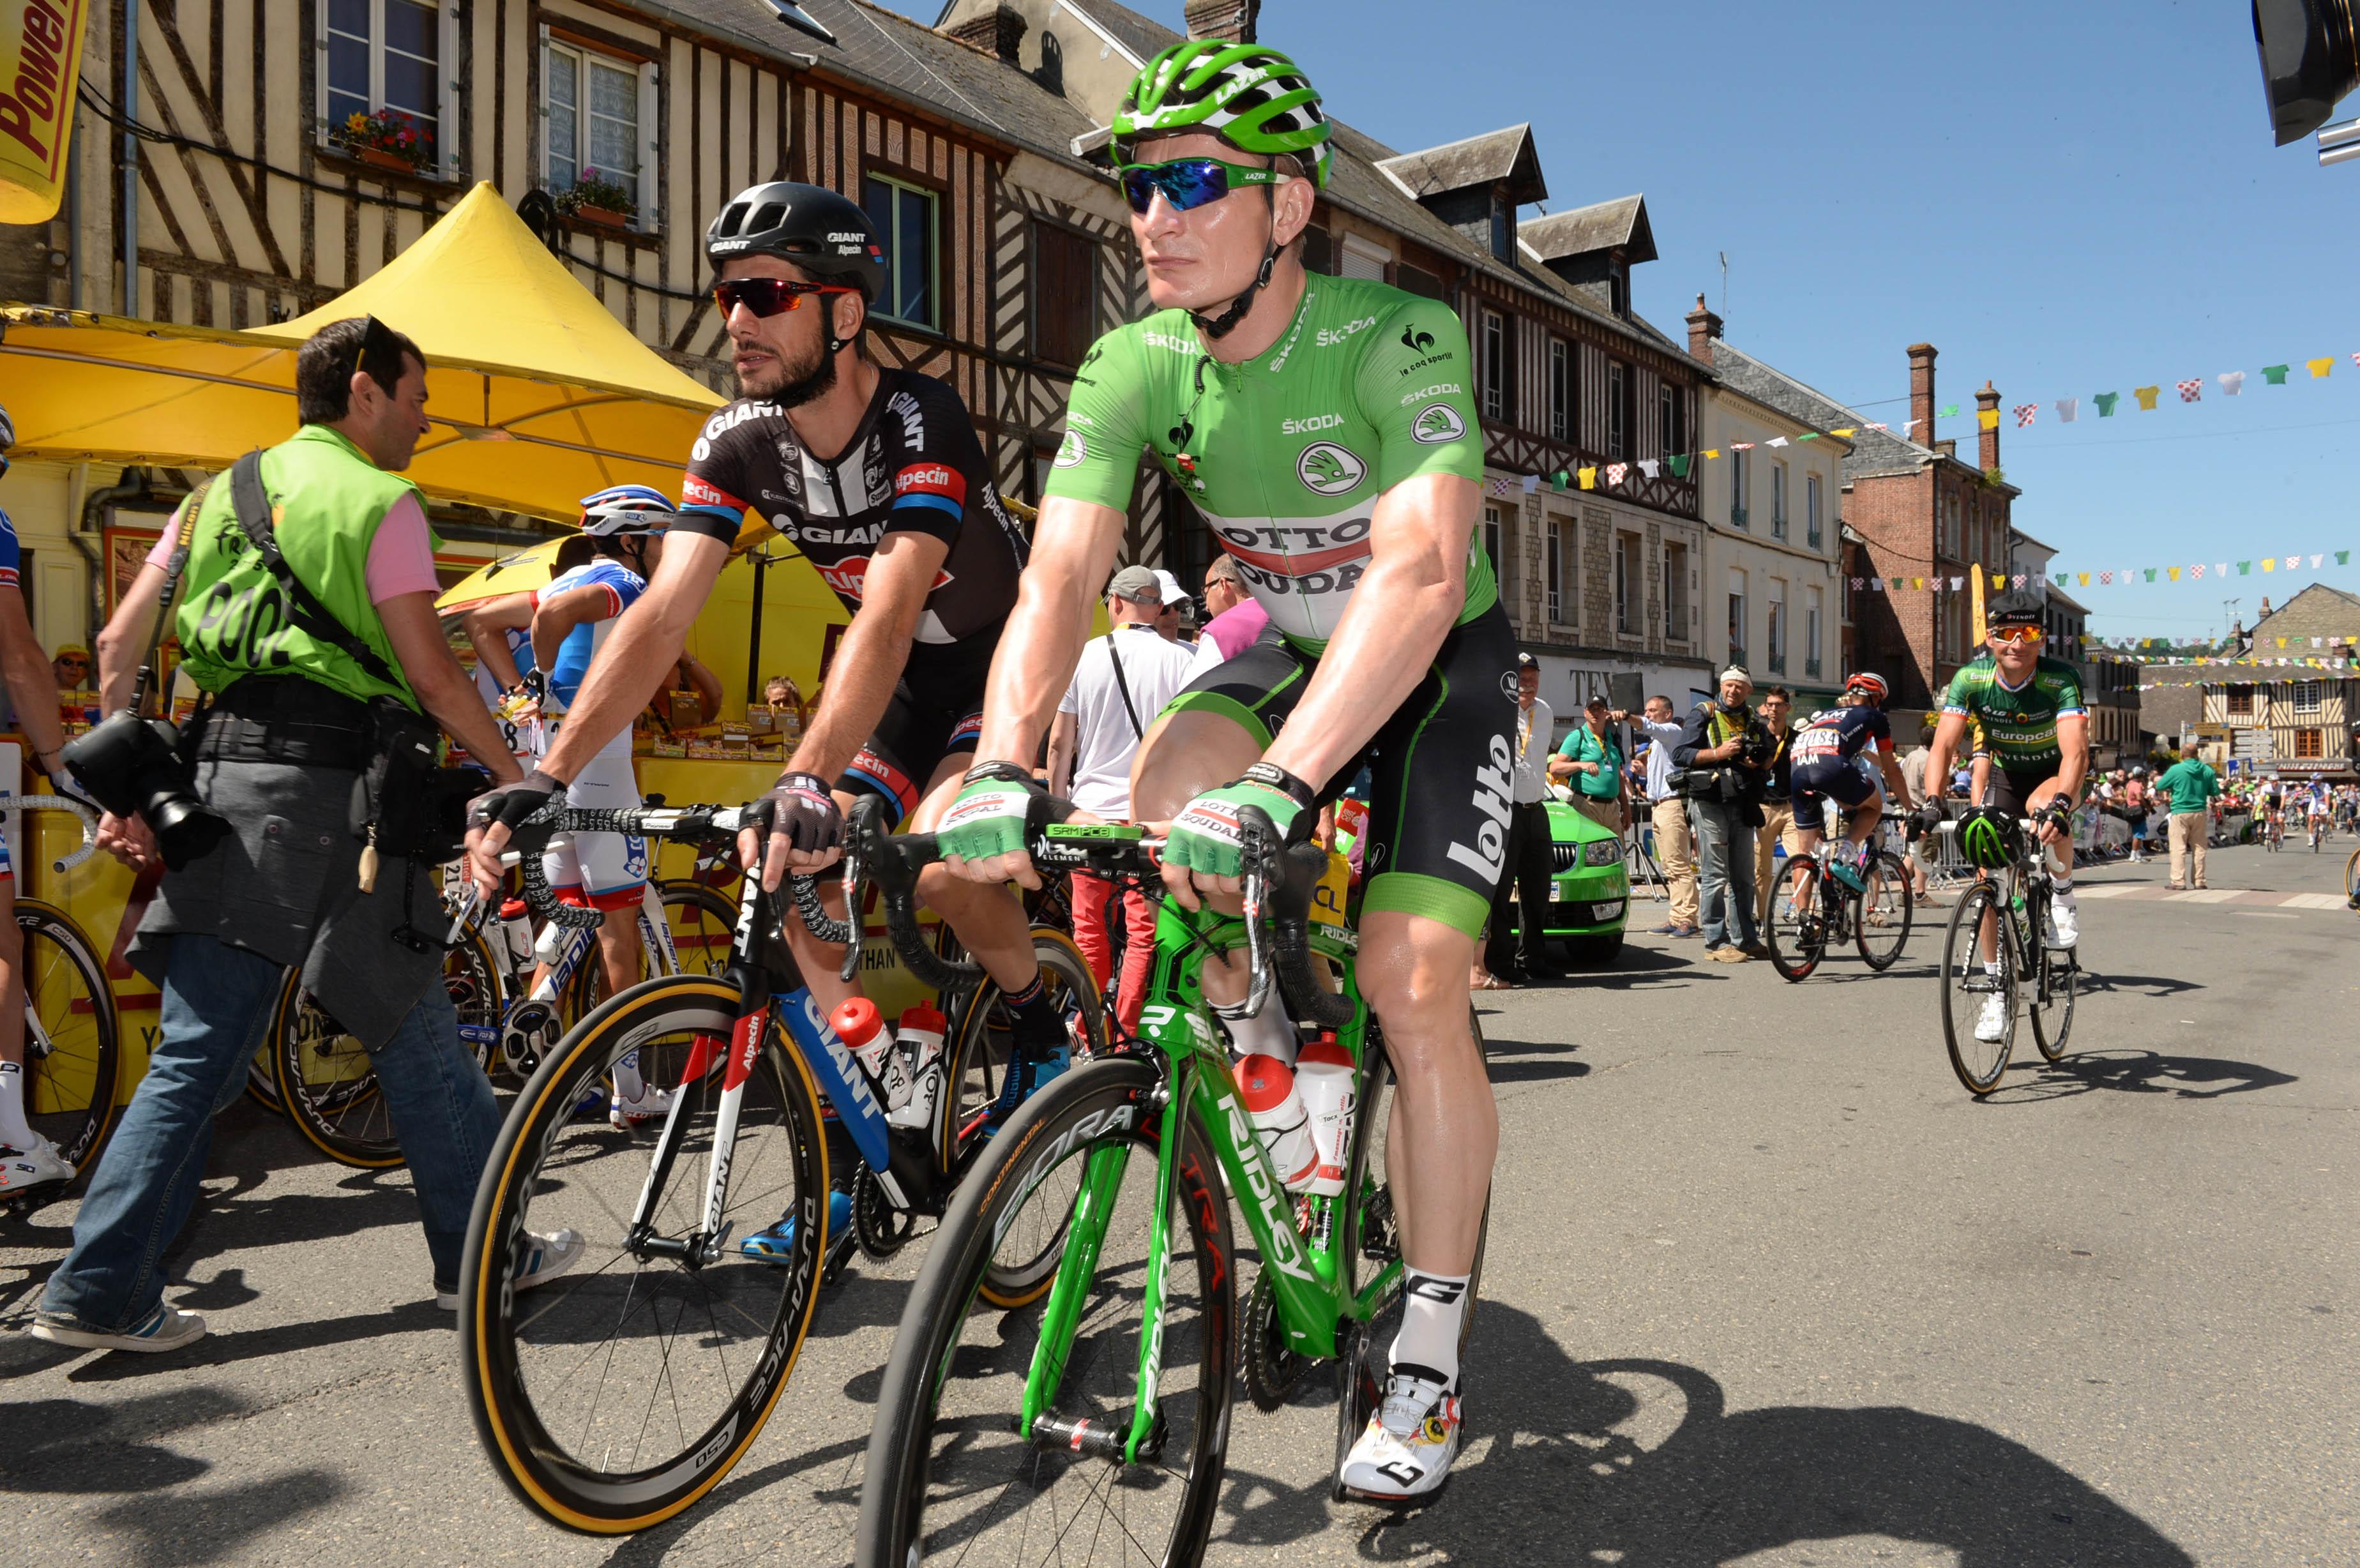 Tour de France 2015 - 7. Etappe - Andre Greipel verteidigt sein grünes Trikot. (pic: Sirotti)